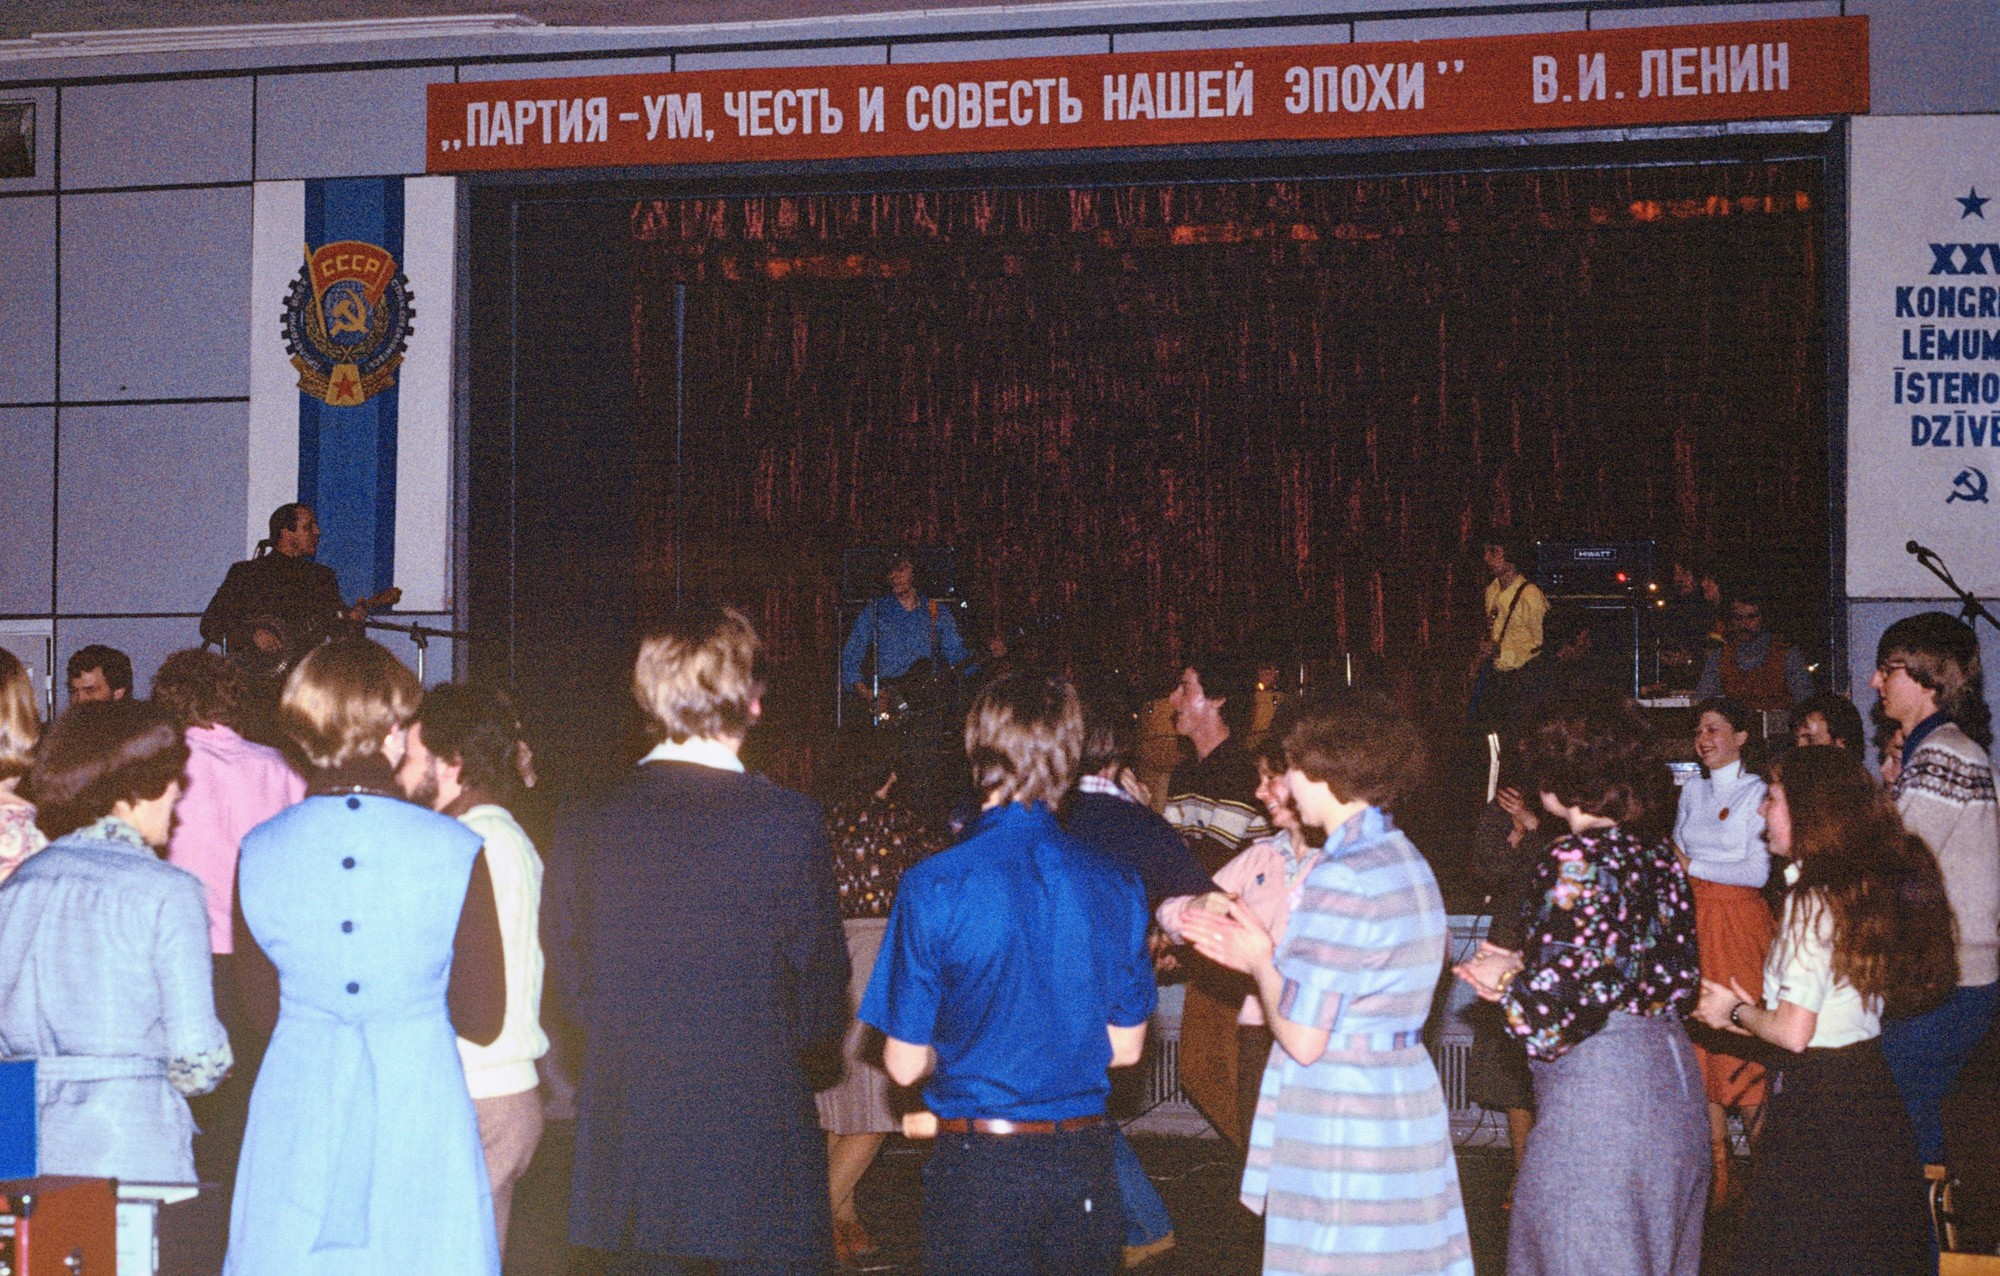 Ms2020_001_BurtonDoug_B1_F8_7_1979_Soviet_Union_006.jpg